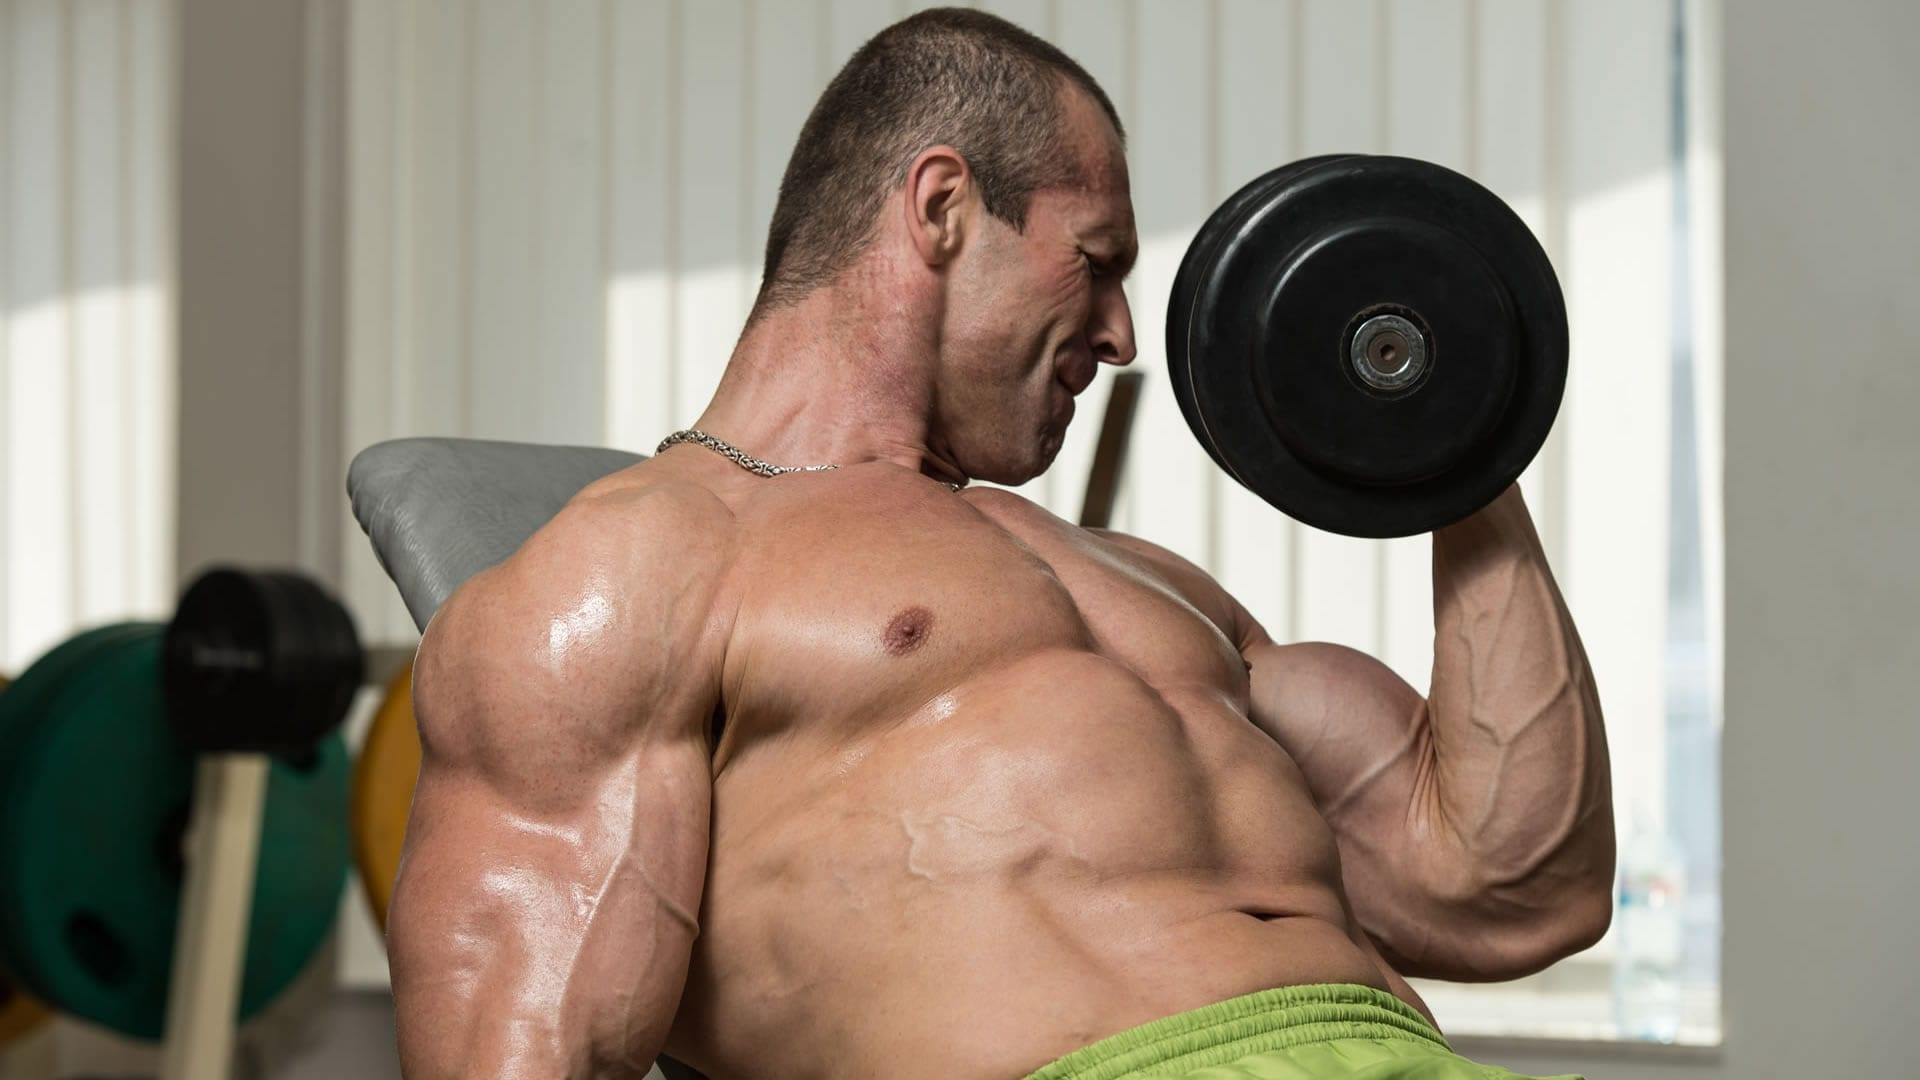 Rutina y dieta para ganar masa muscular | Cambiatufisico